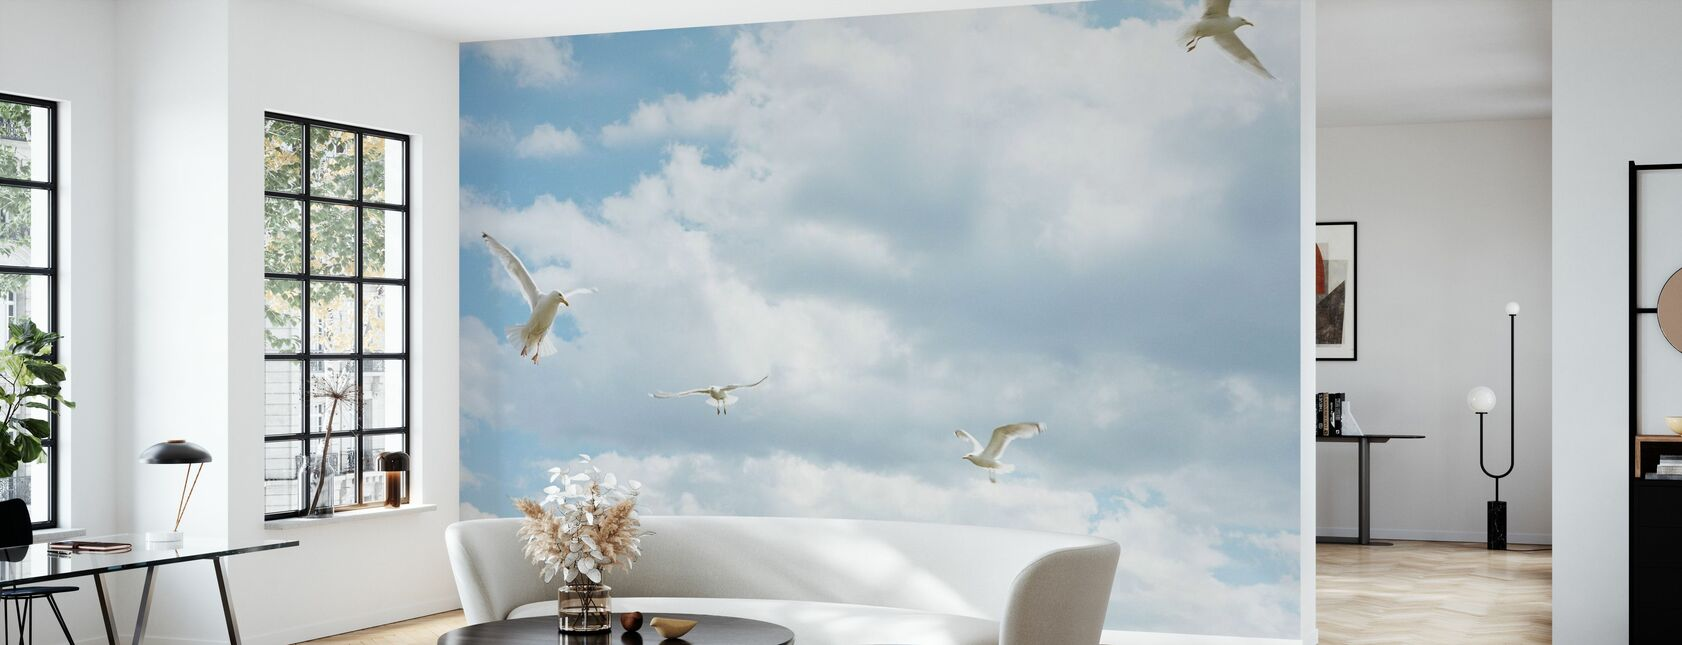 Seagull in the Sky - Wallpaper - Living Room